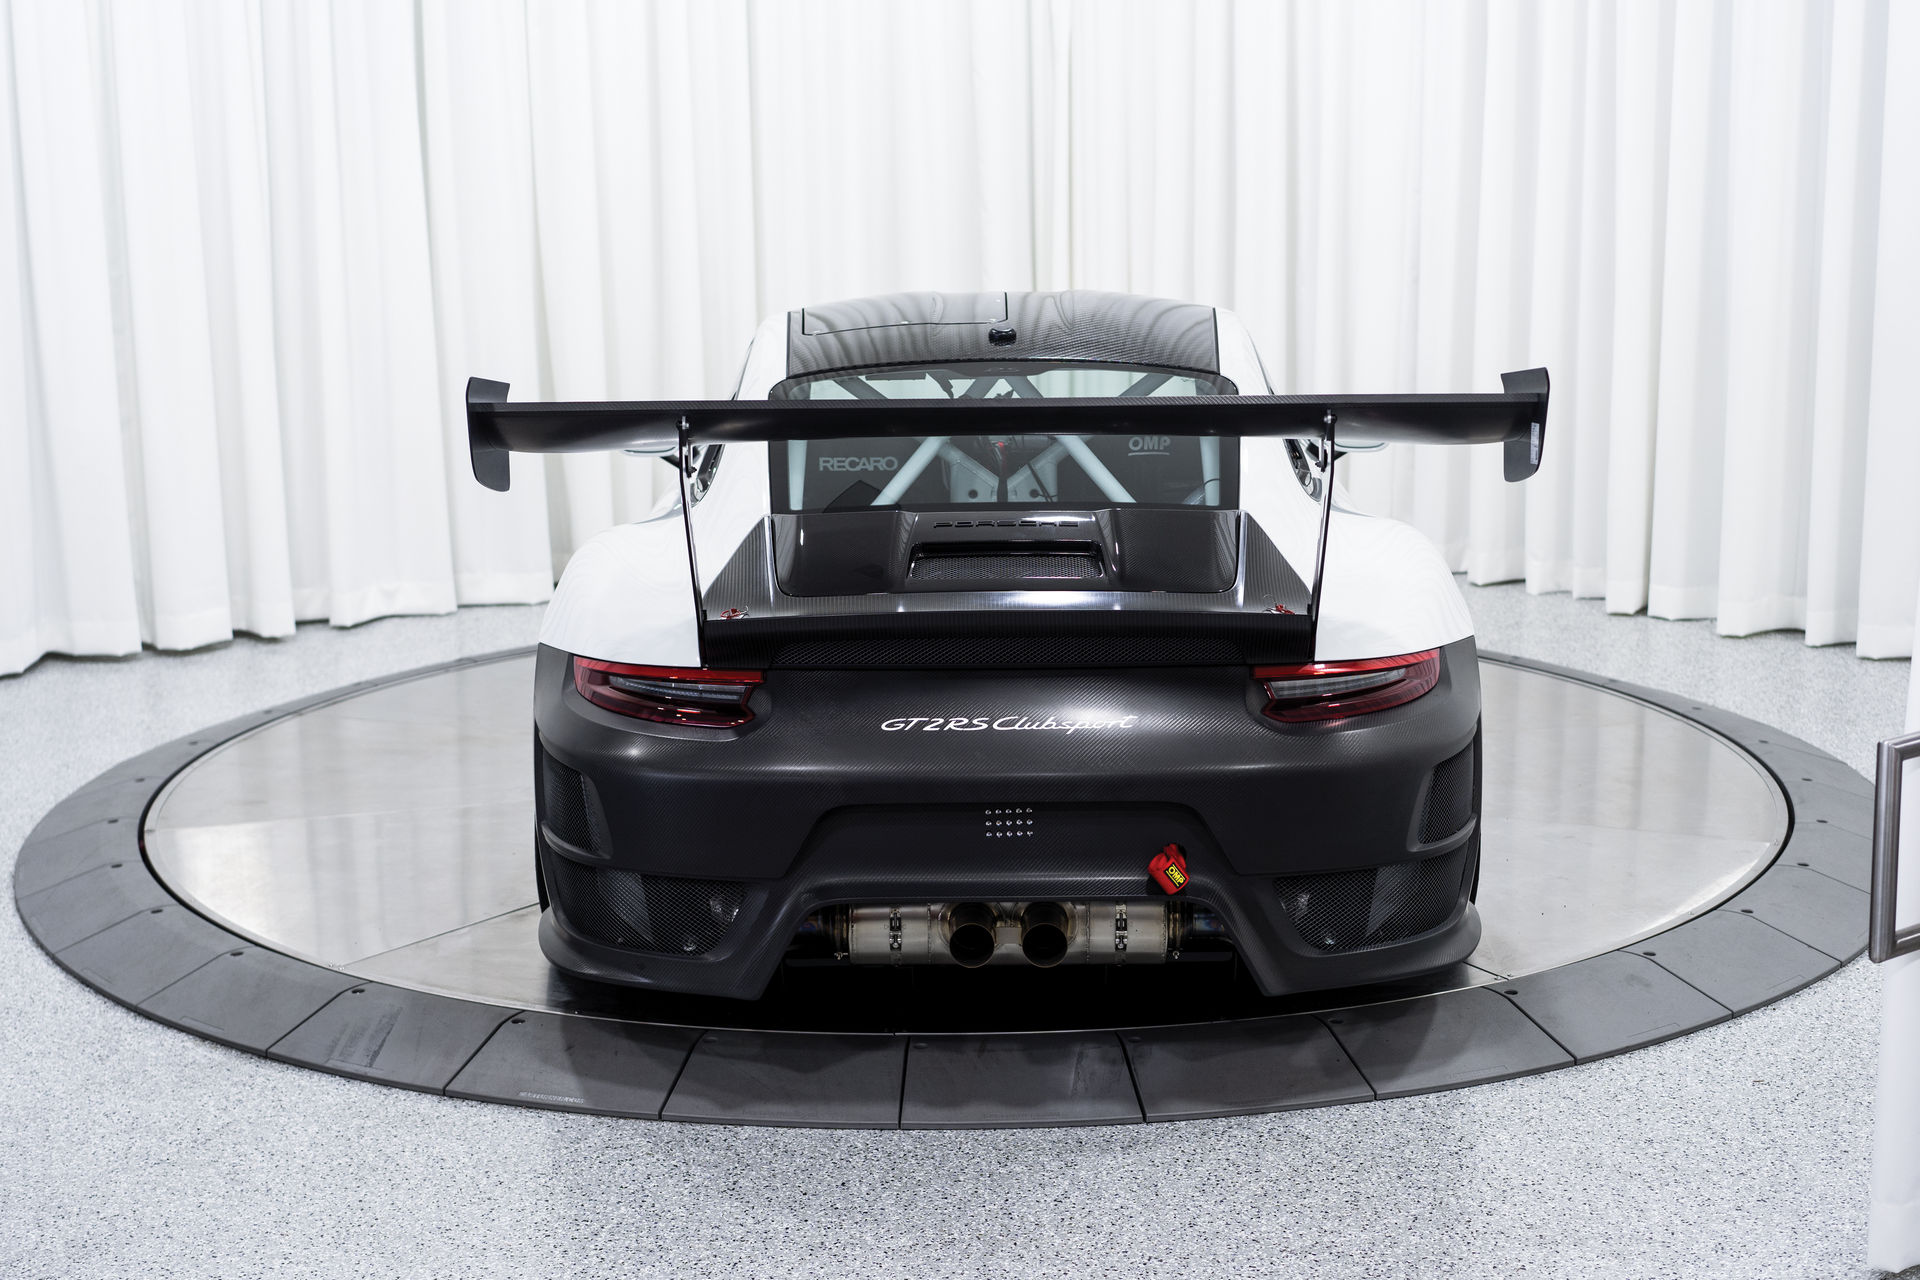 Porsche-911-GT2-RS-Clubsport-auction-12